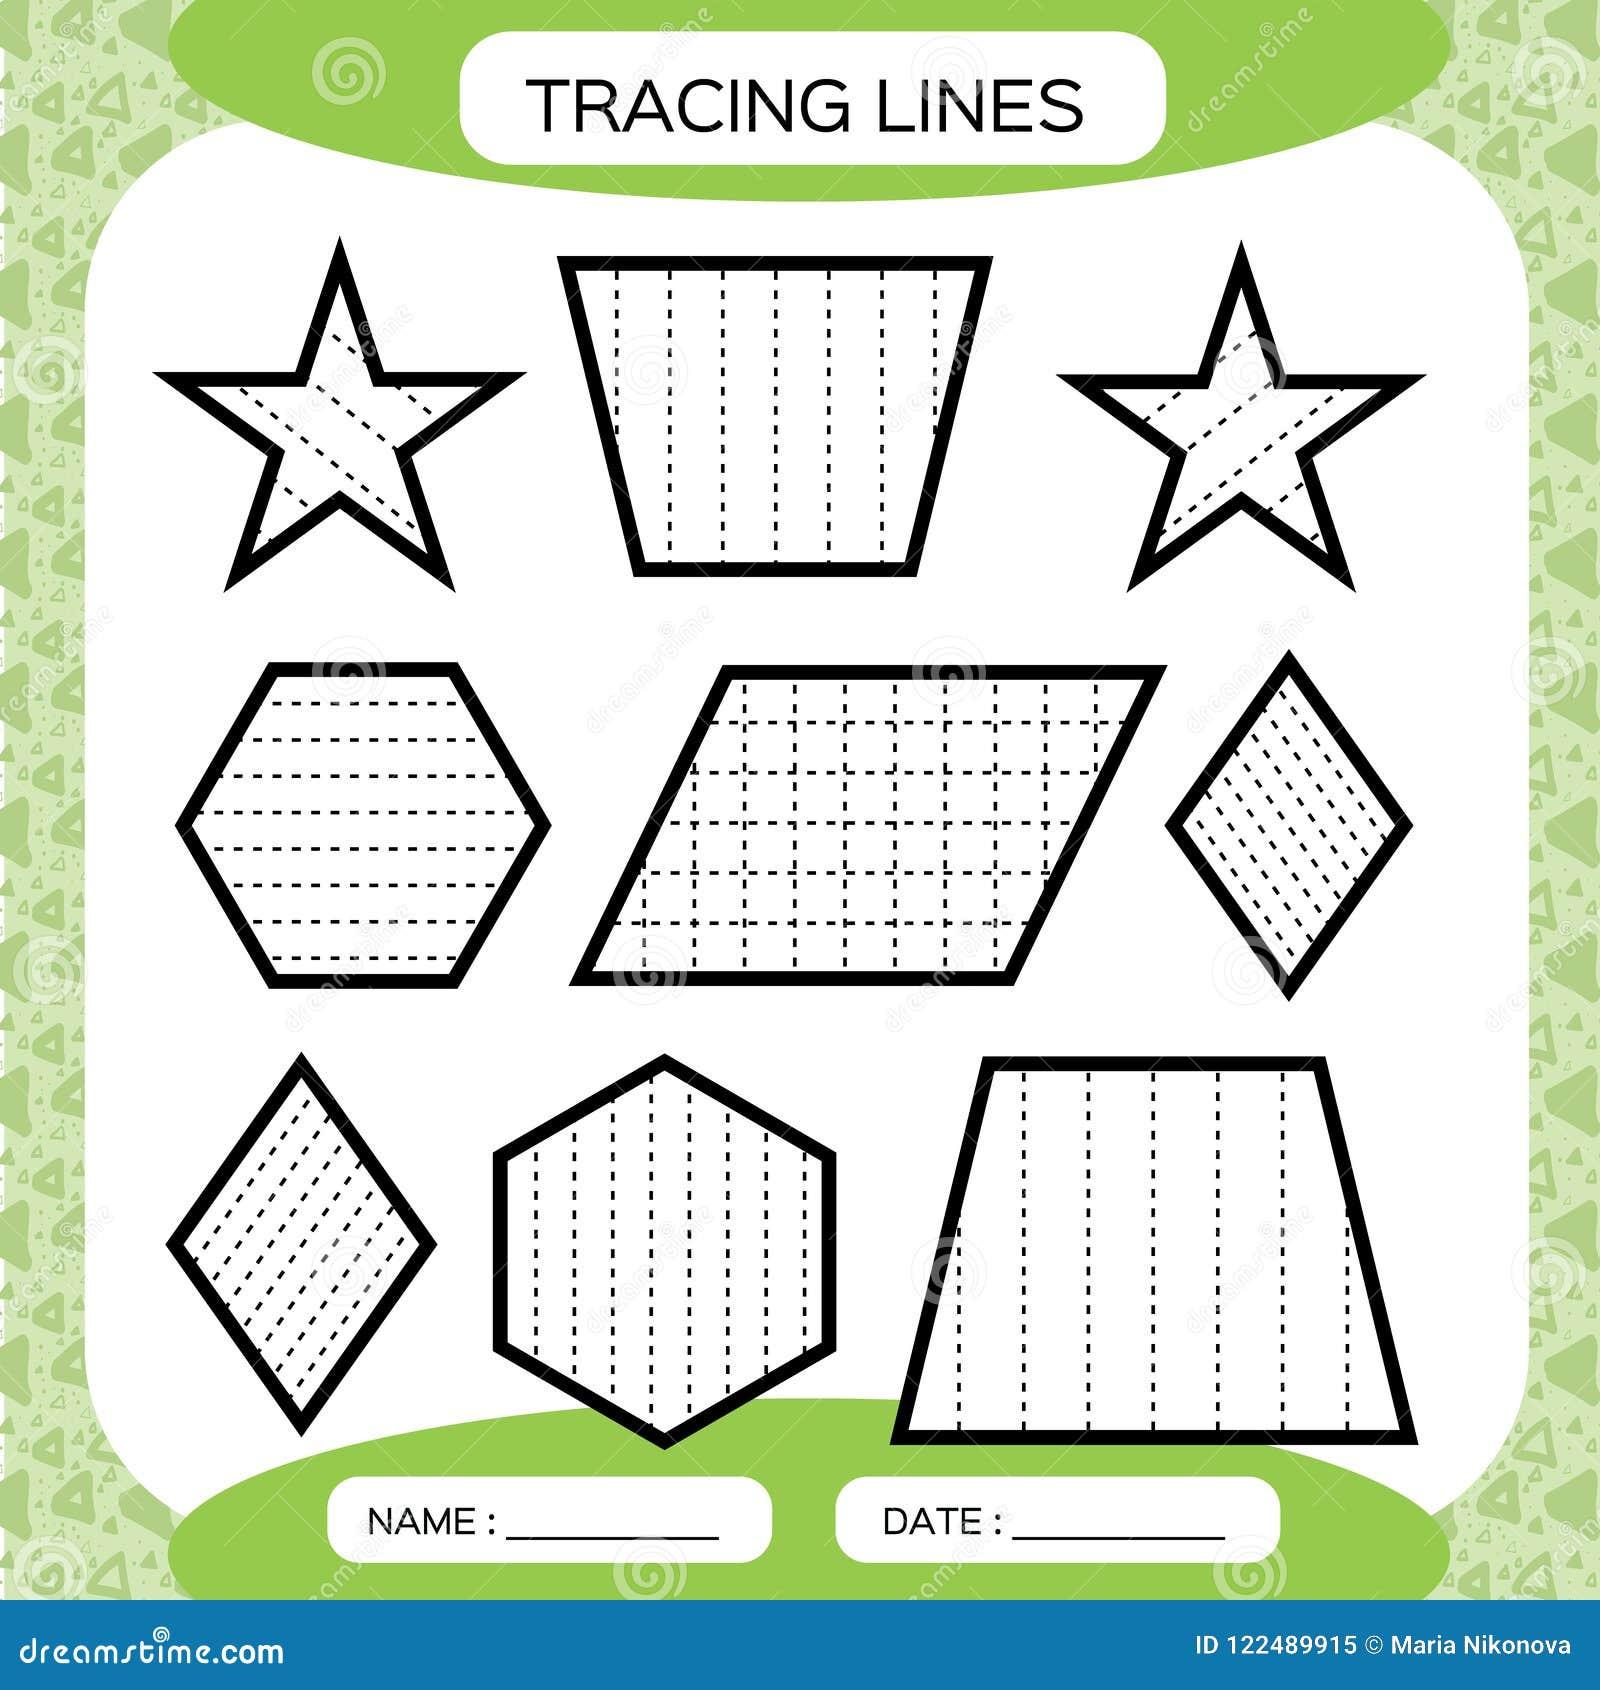 Tracing Lines. Kids Education. Preschool Worksheet. Basic Writing ...